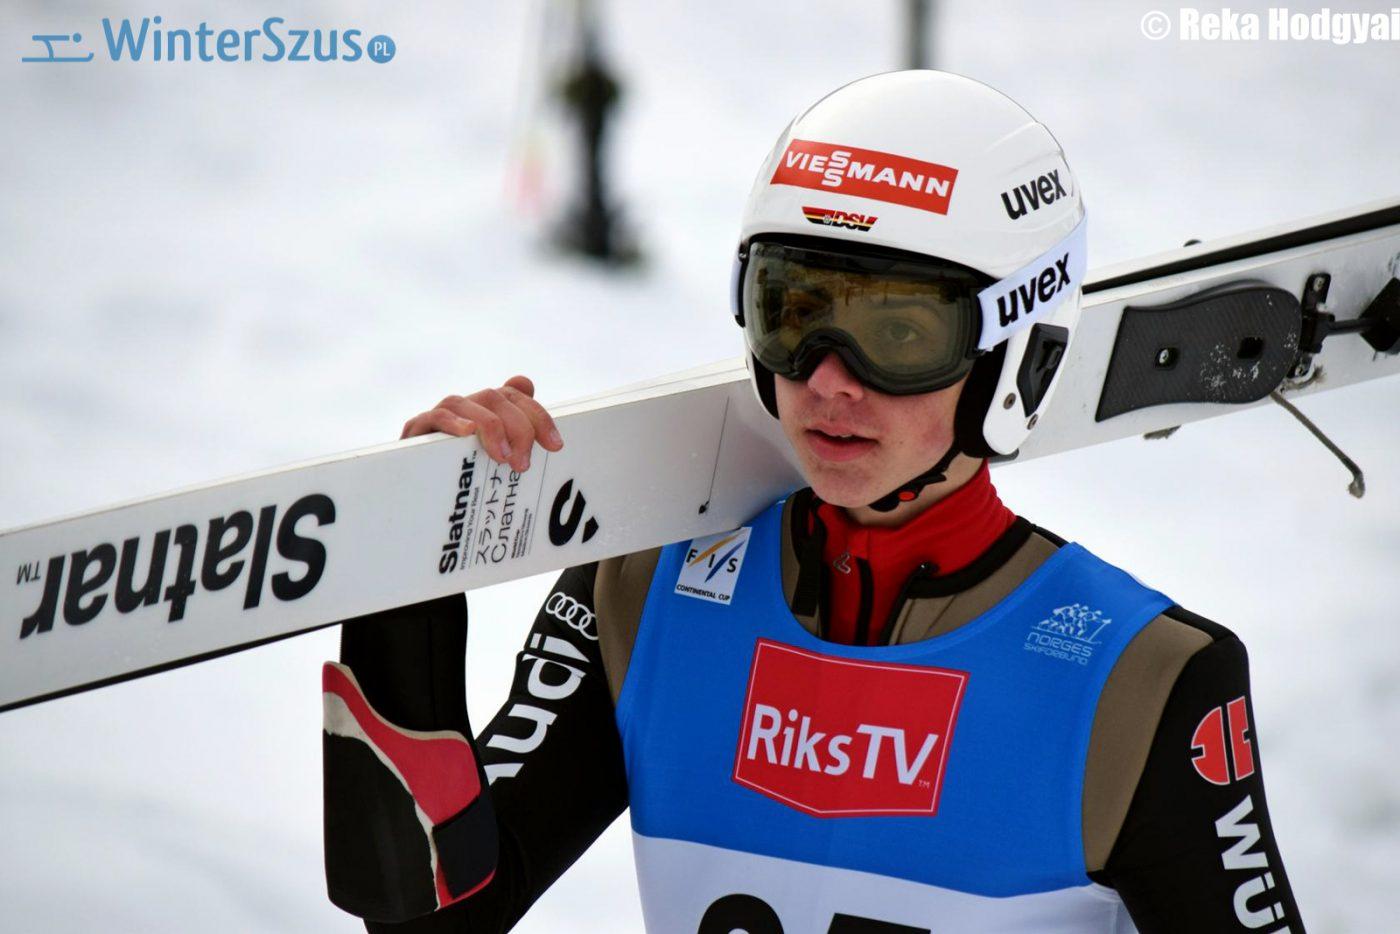 Constantin Schmid